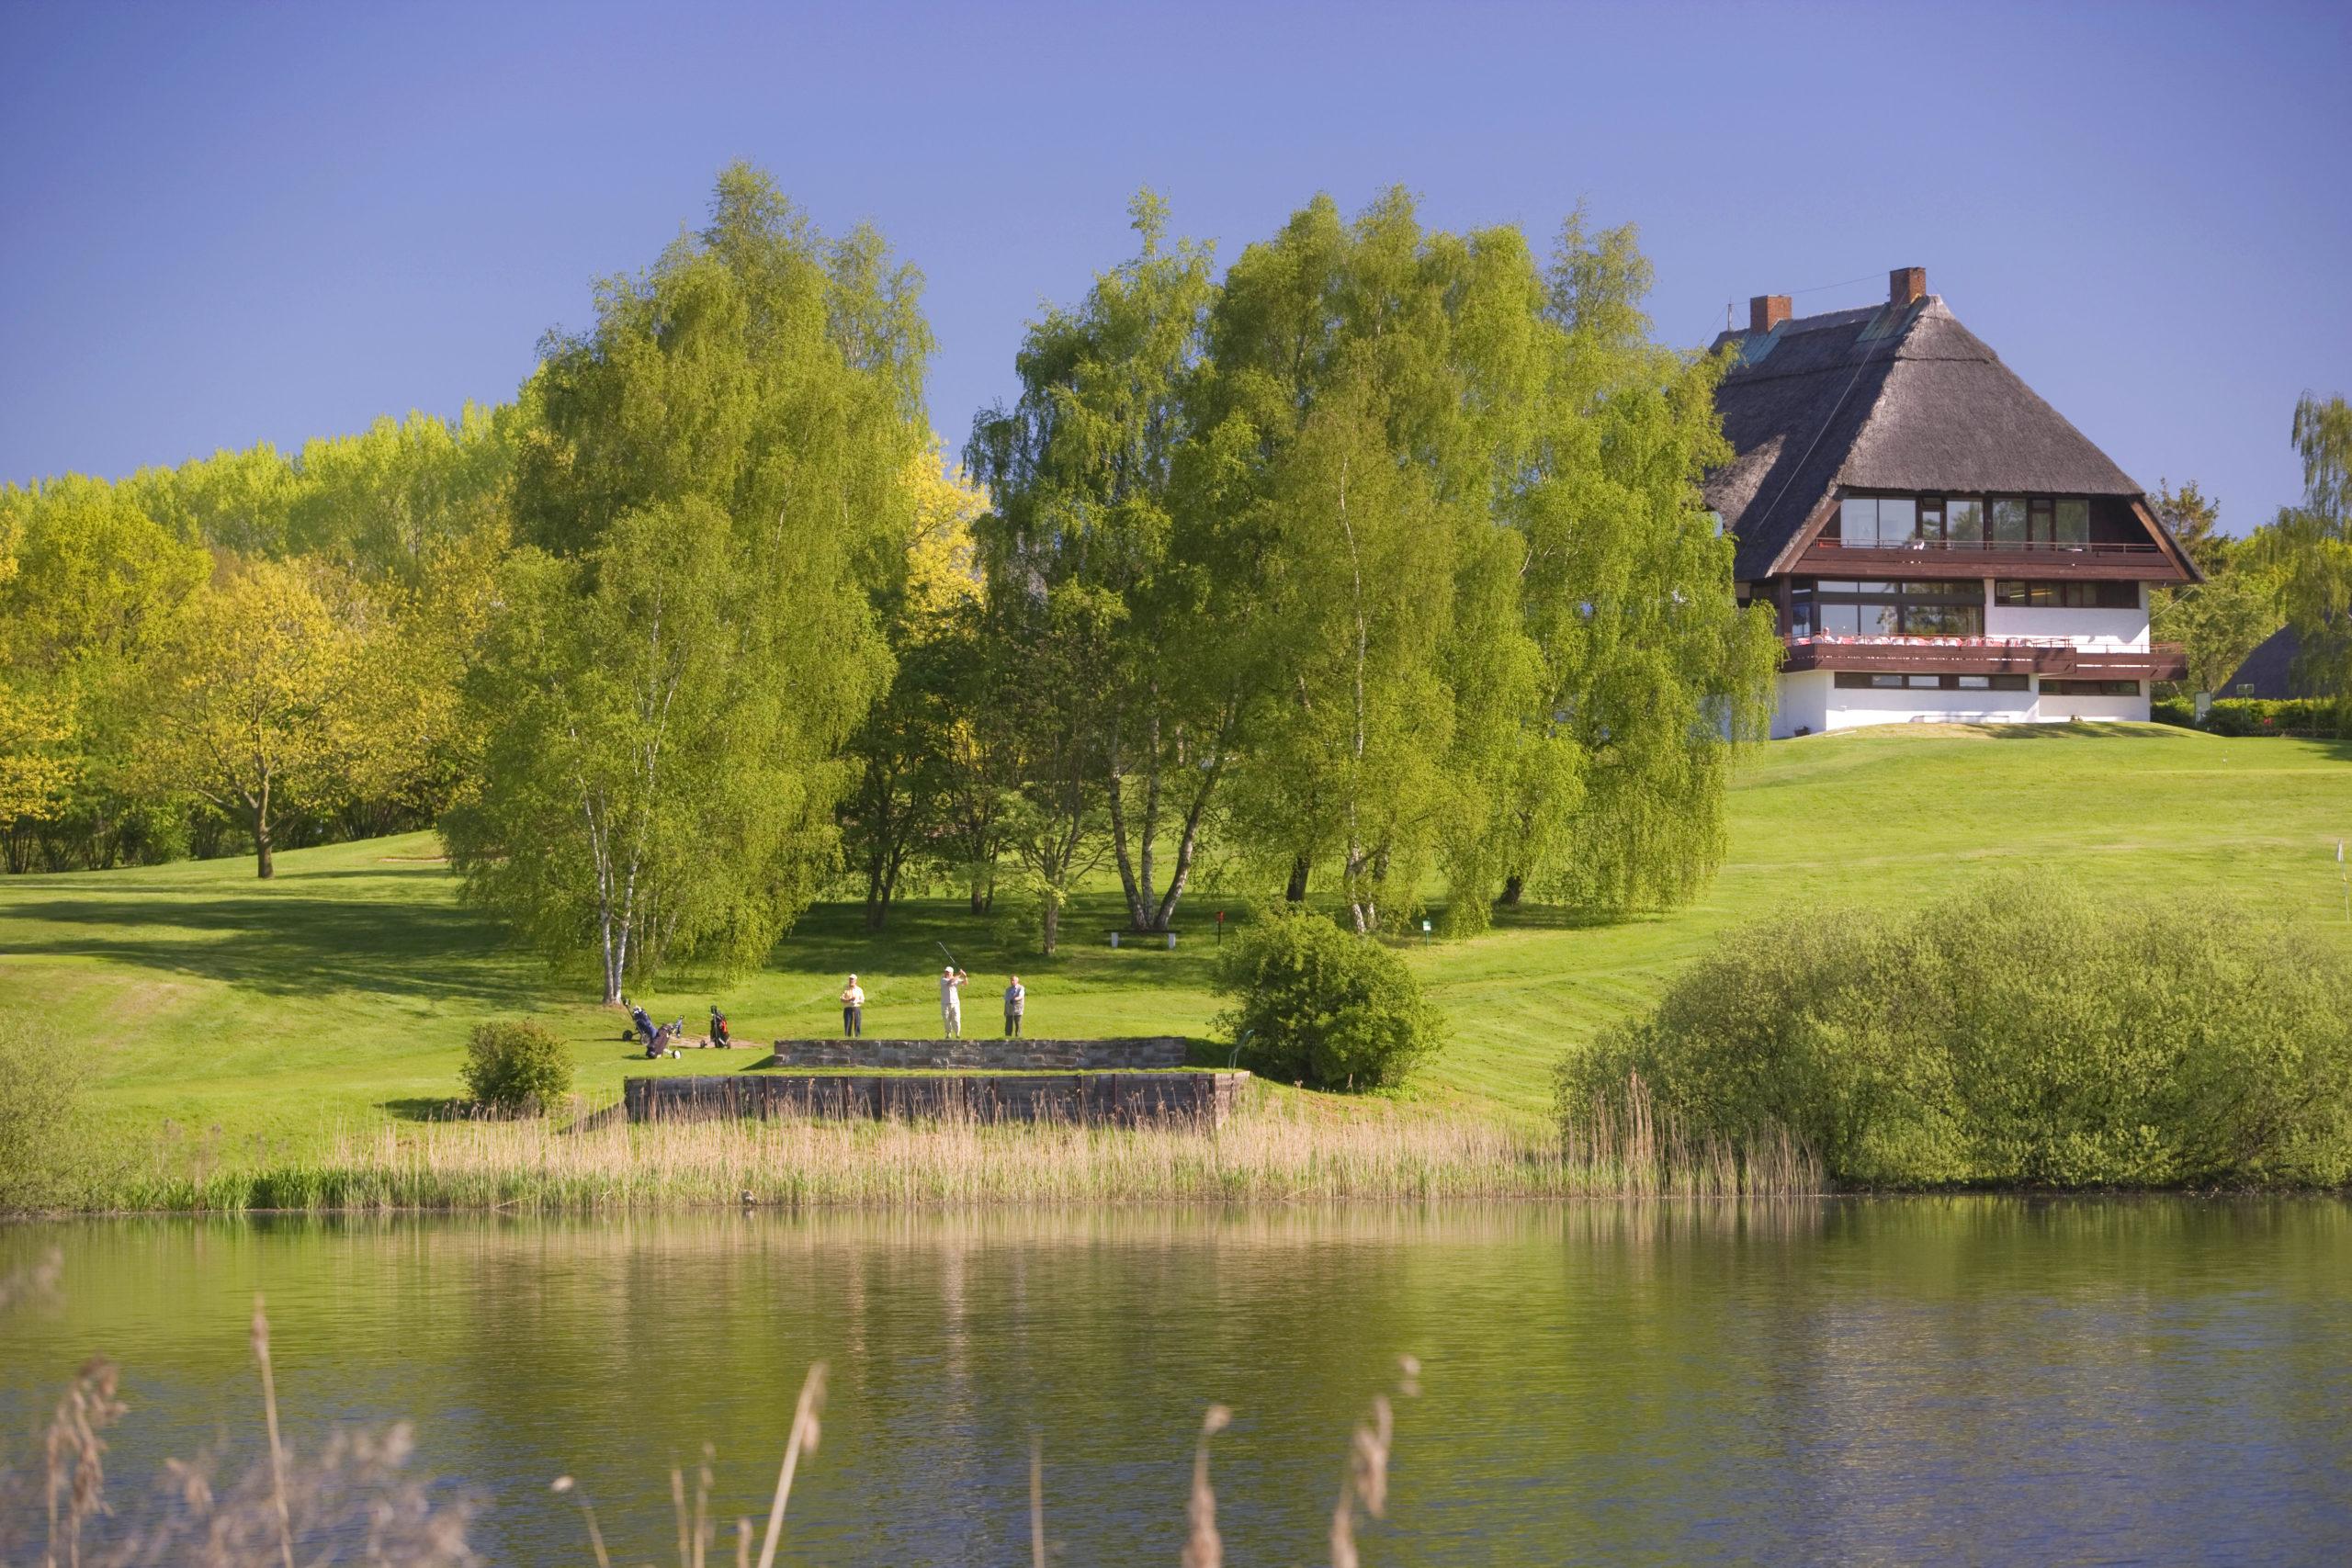 Strandgrün Golf- & Wellnessresort Timmendorfer Strand